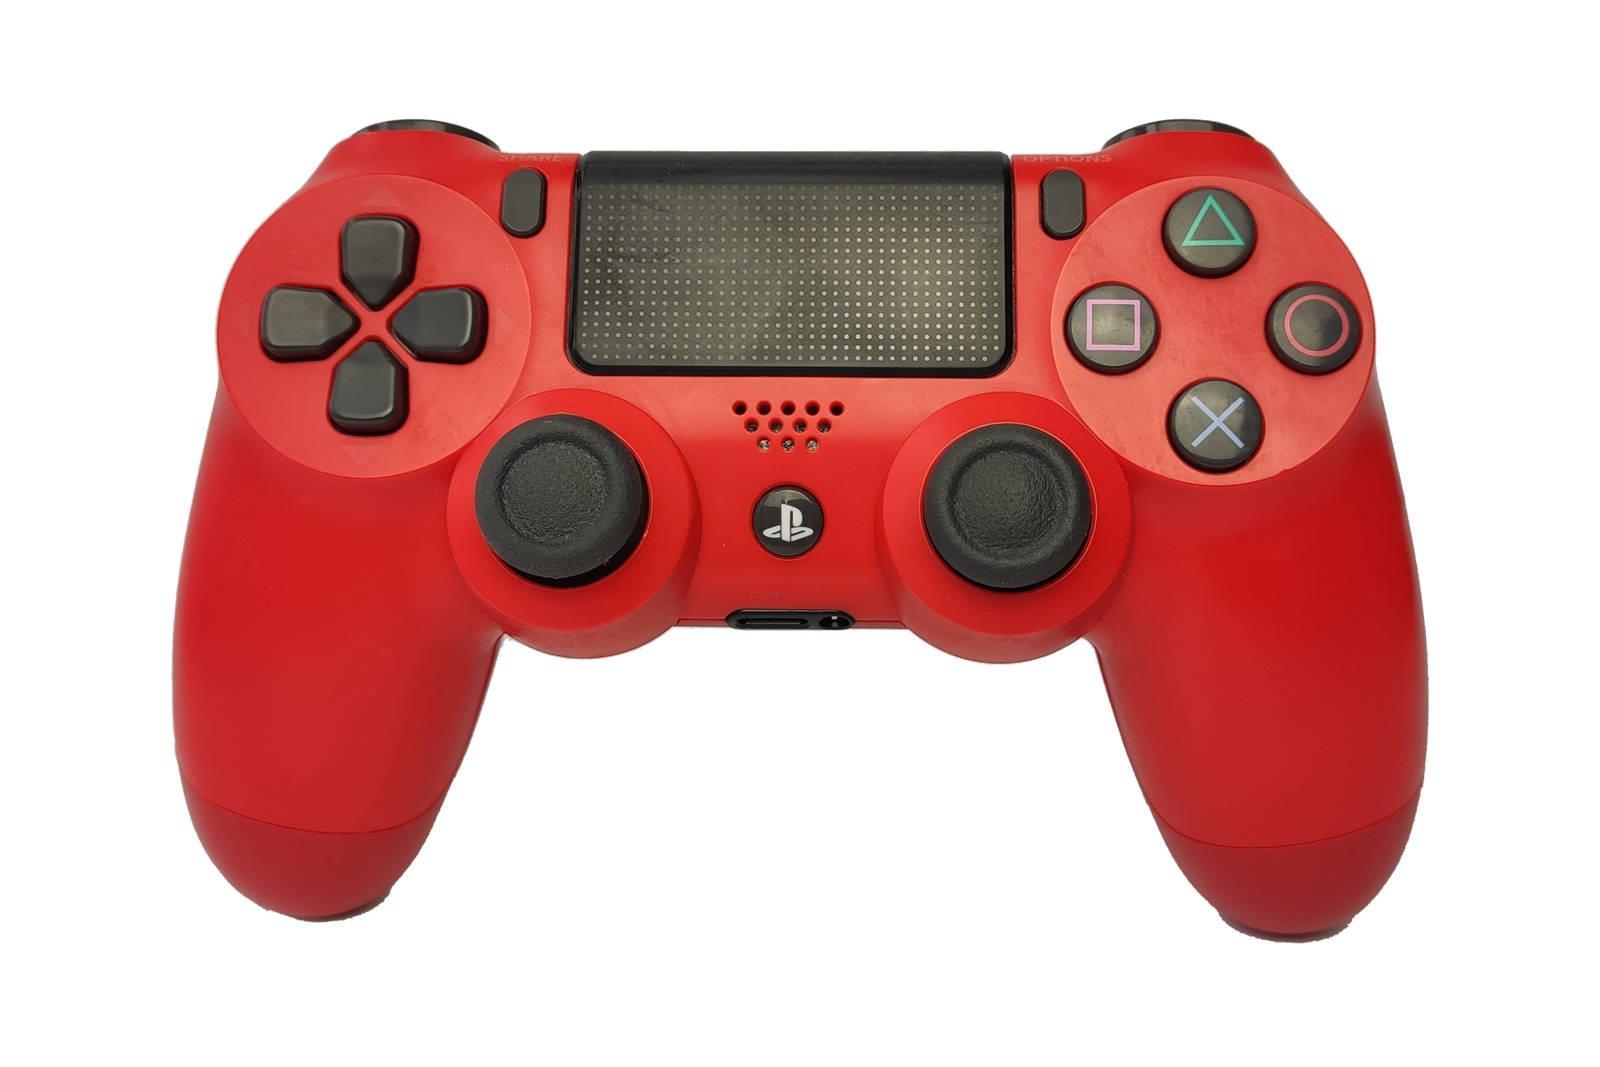 Gamepad Controller Playstation 4 PS4 v2 Magma Red